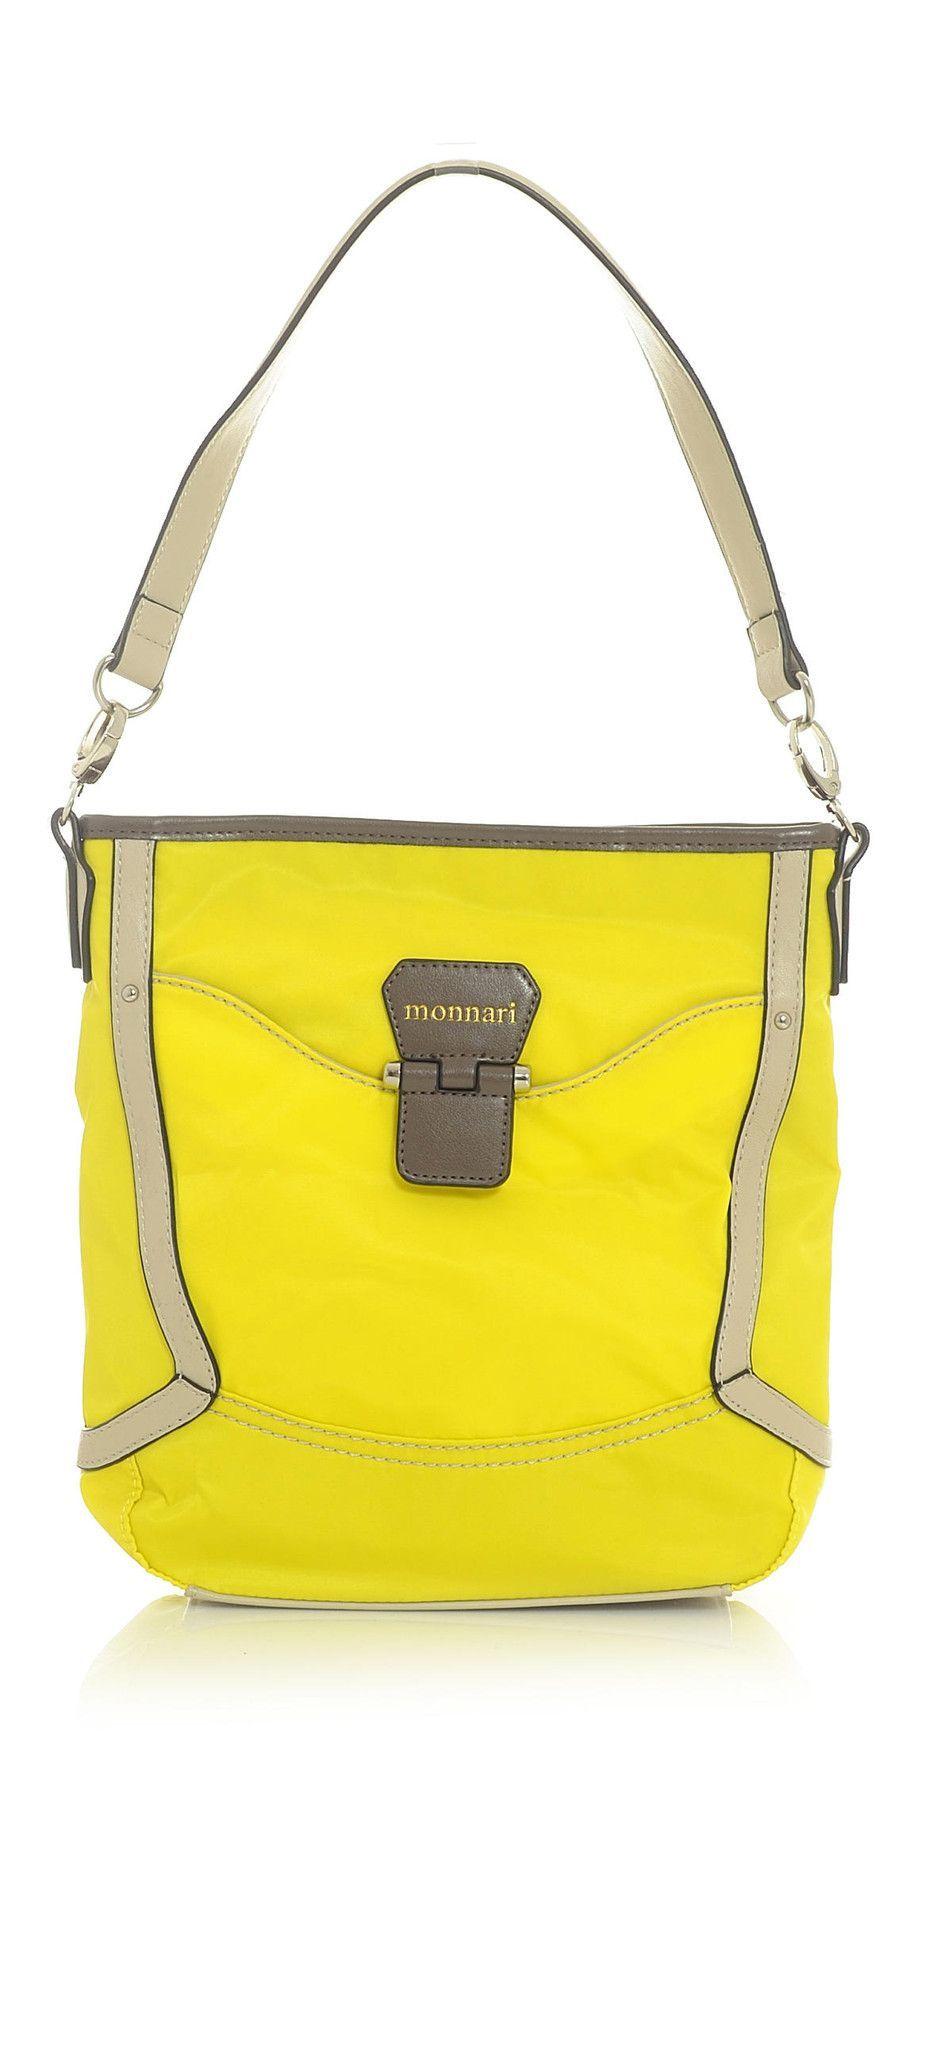 Neon Yellow Tote Handbag with Cream & Taupe Trim